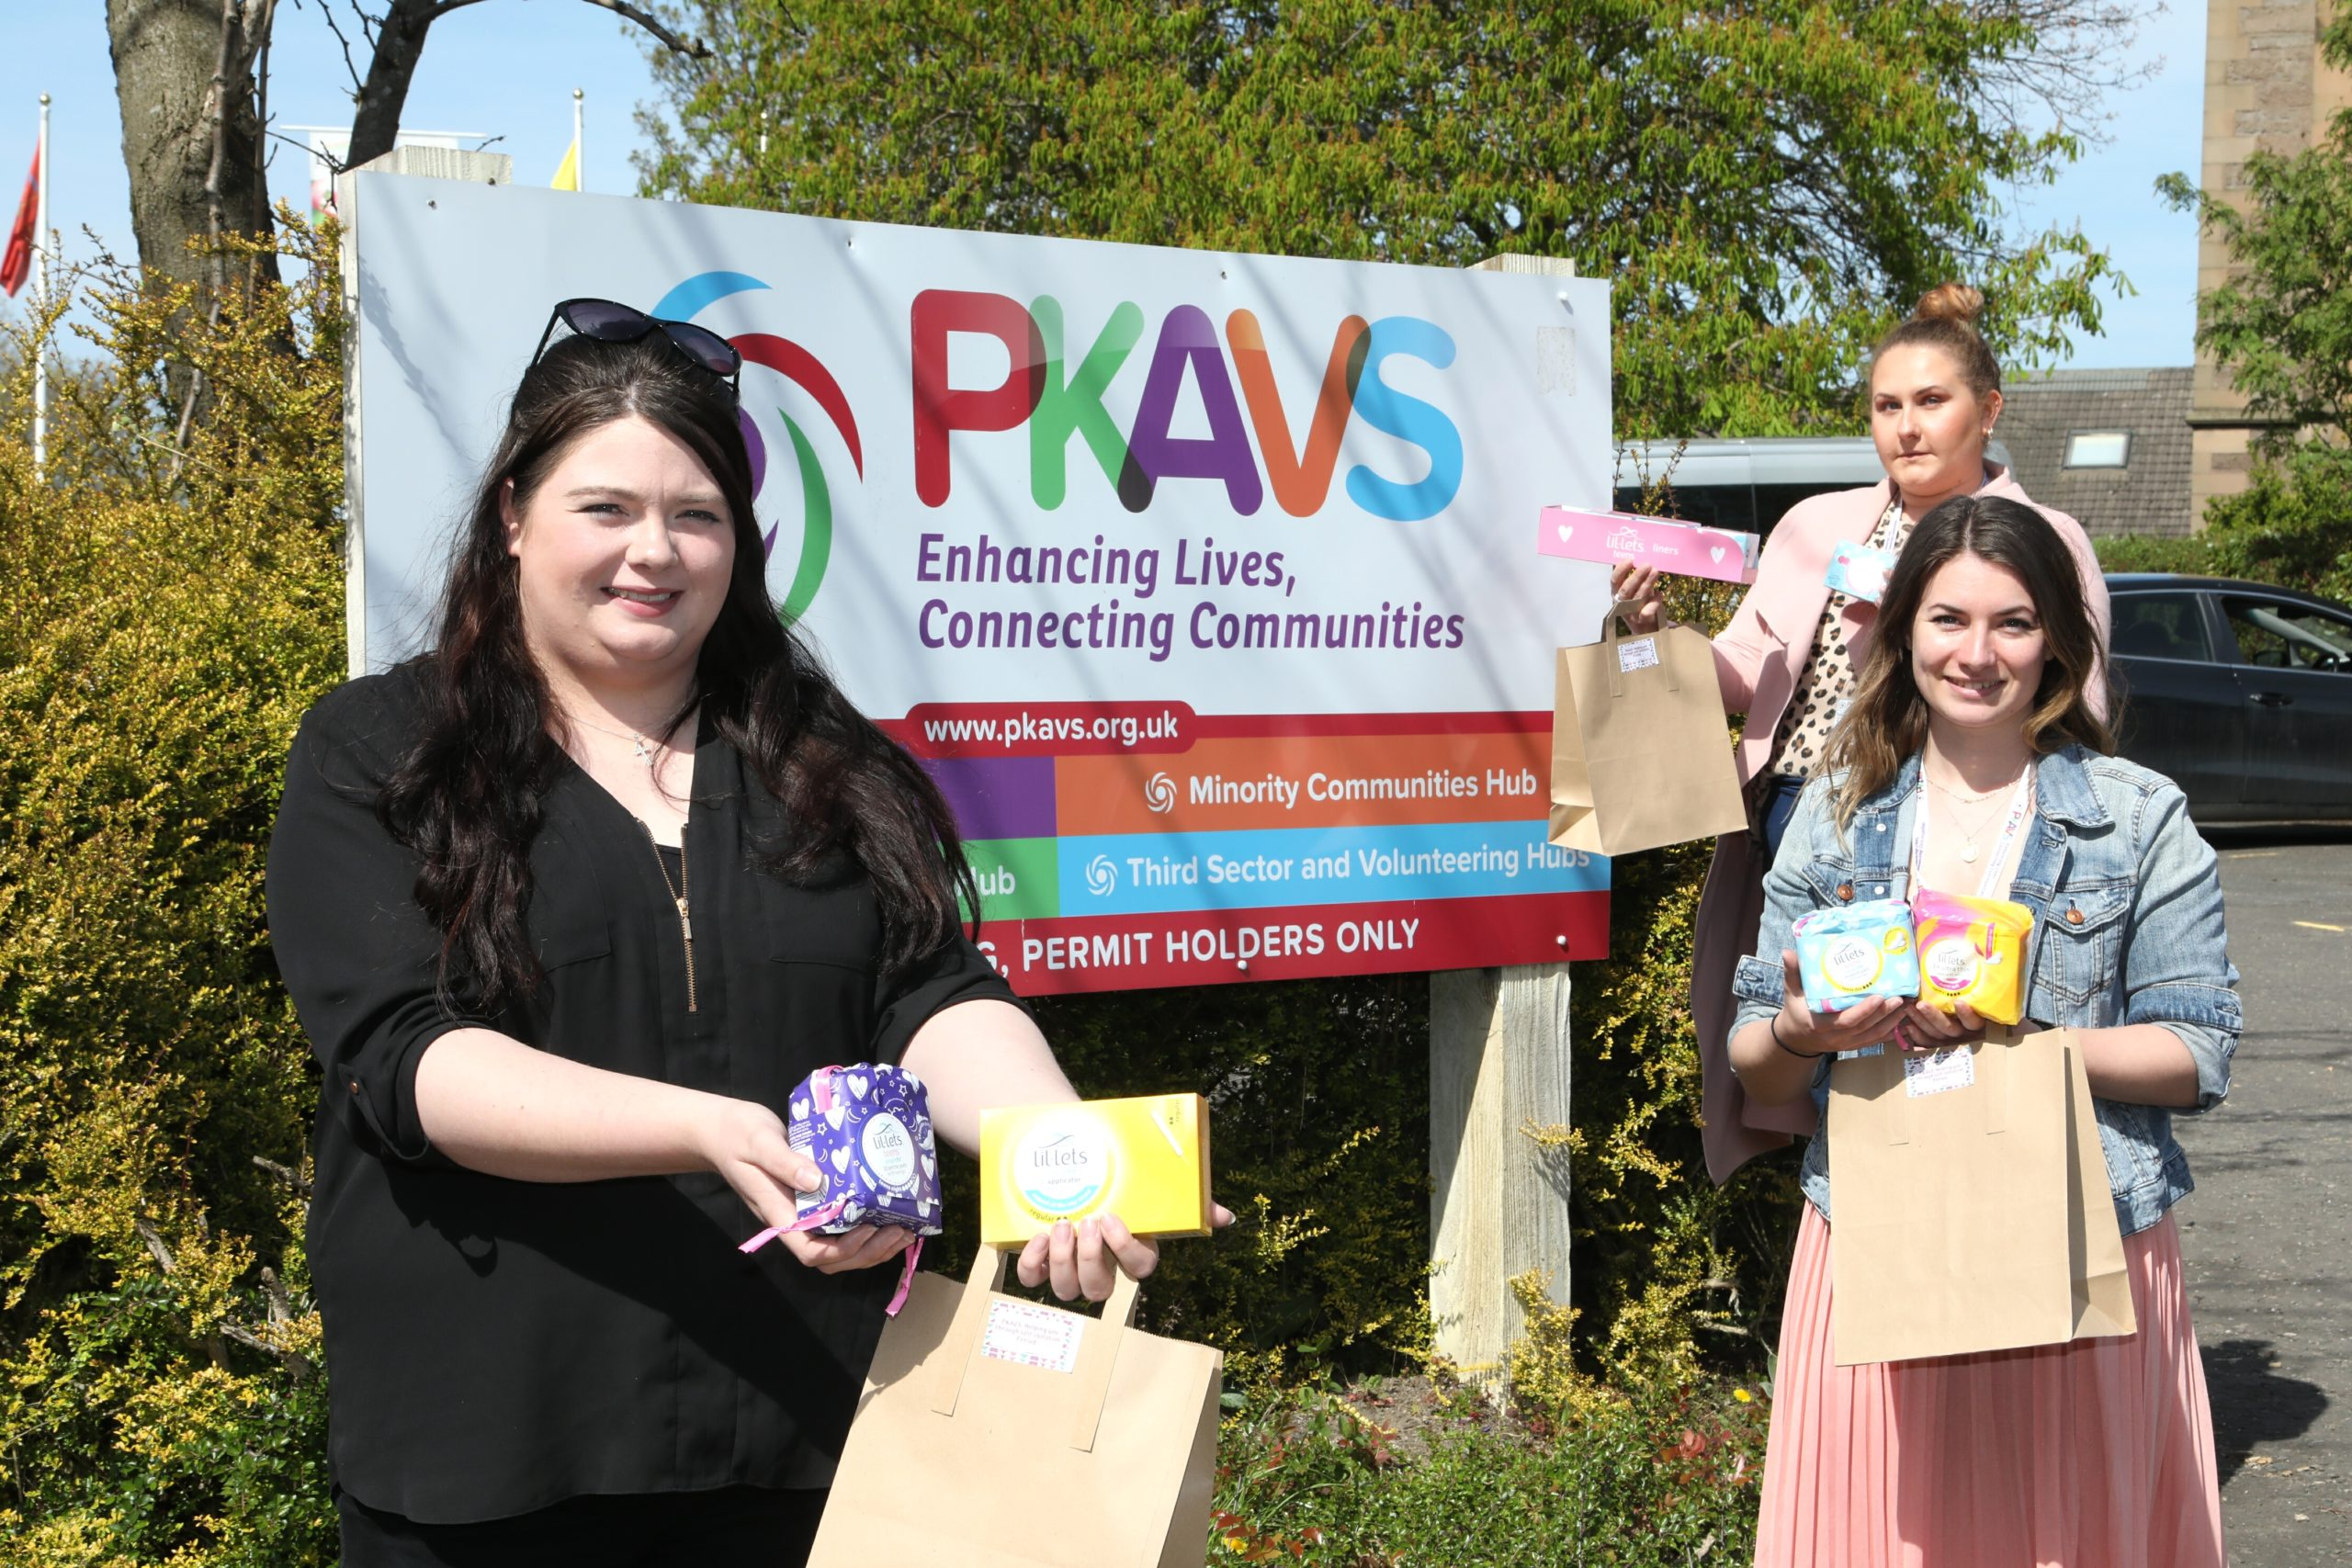 PKAVS staff Jenni Keenan, Amy Bryson and Agnieszka Morrison. Picture: Gareth Jennings.